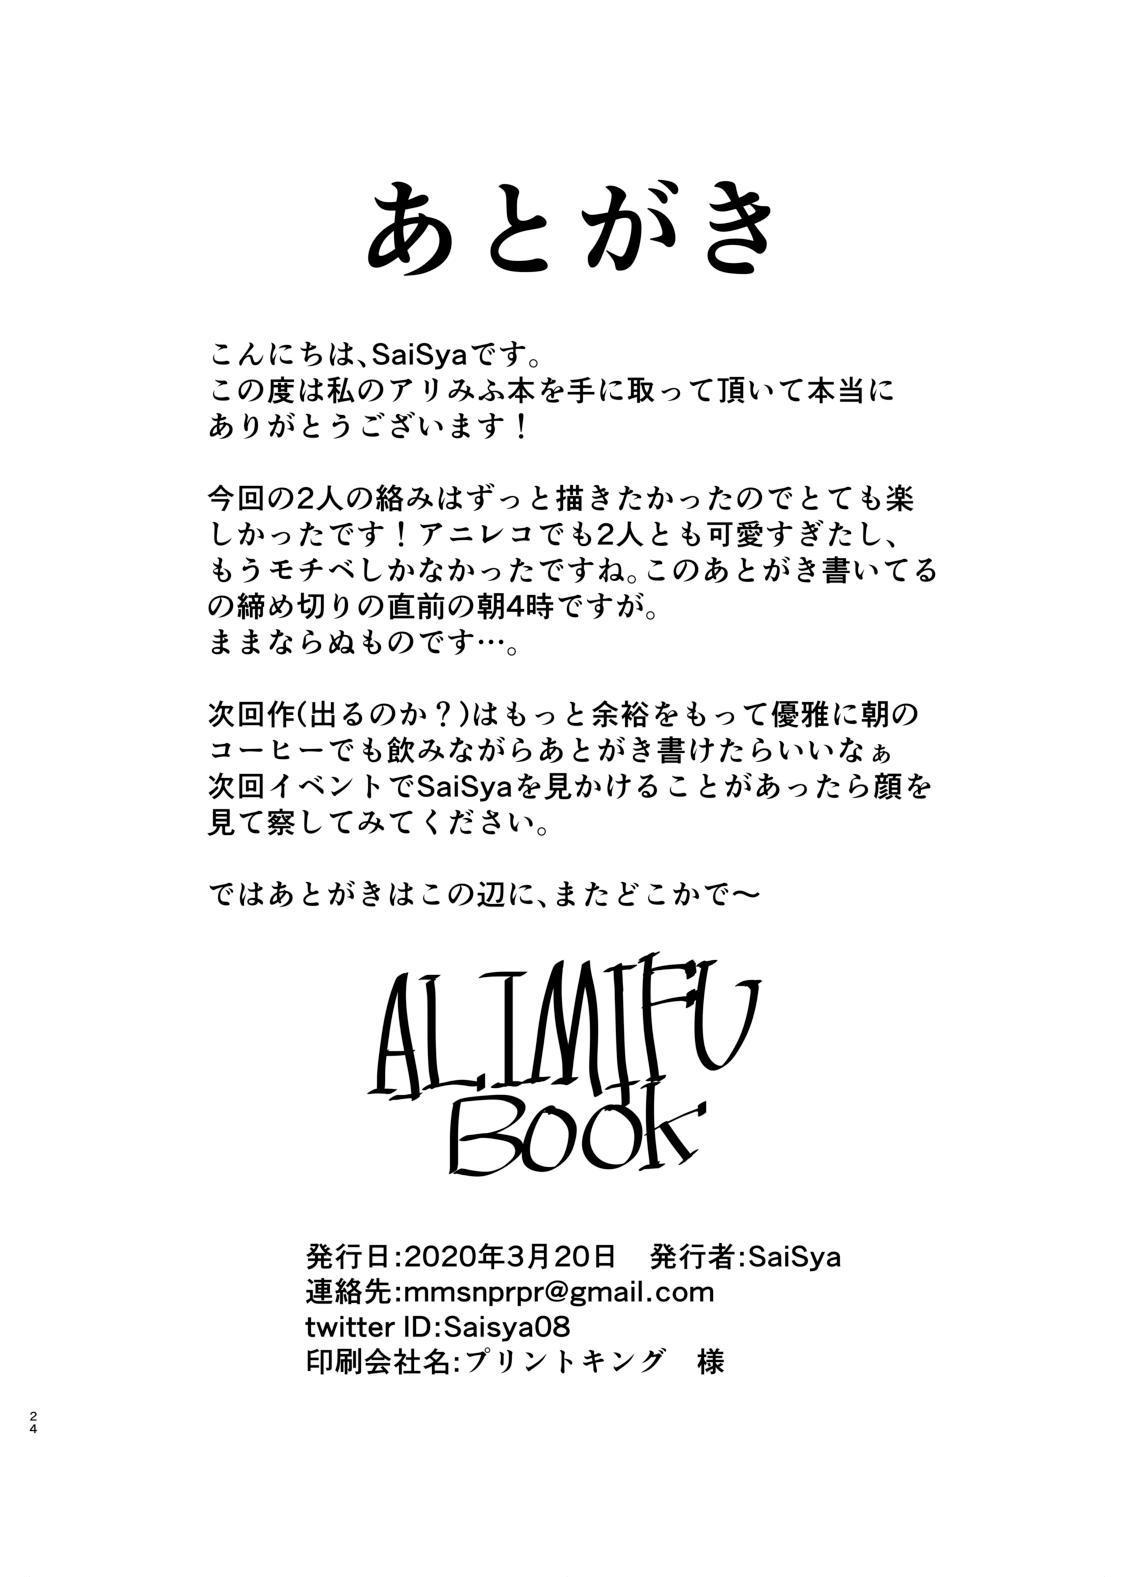 Ali Mifu Book 23